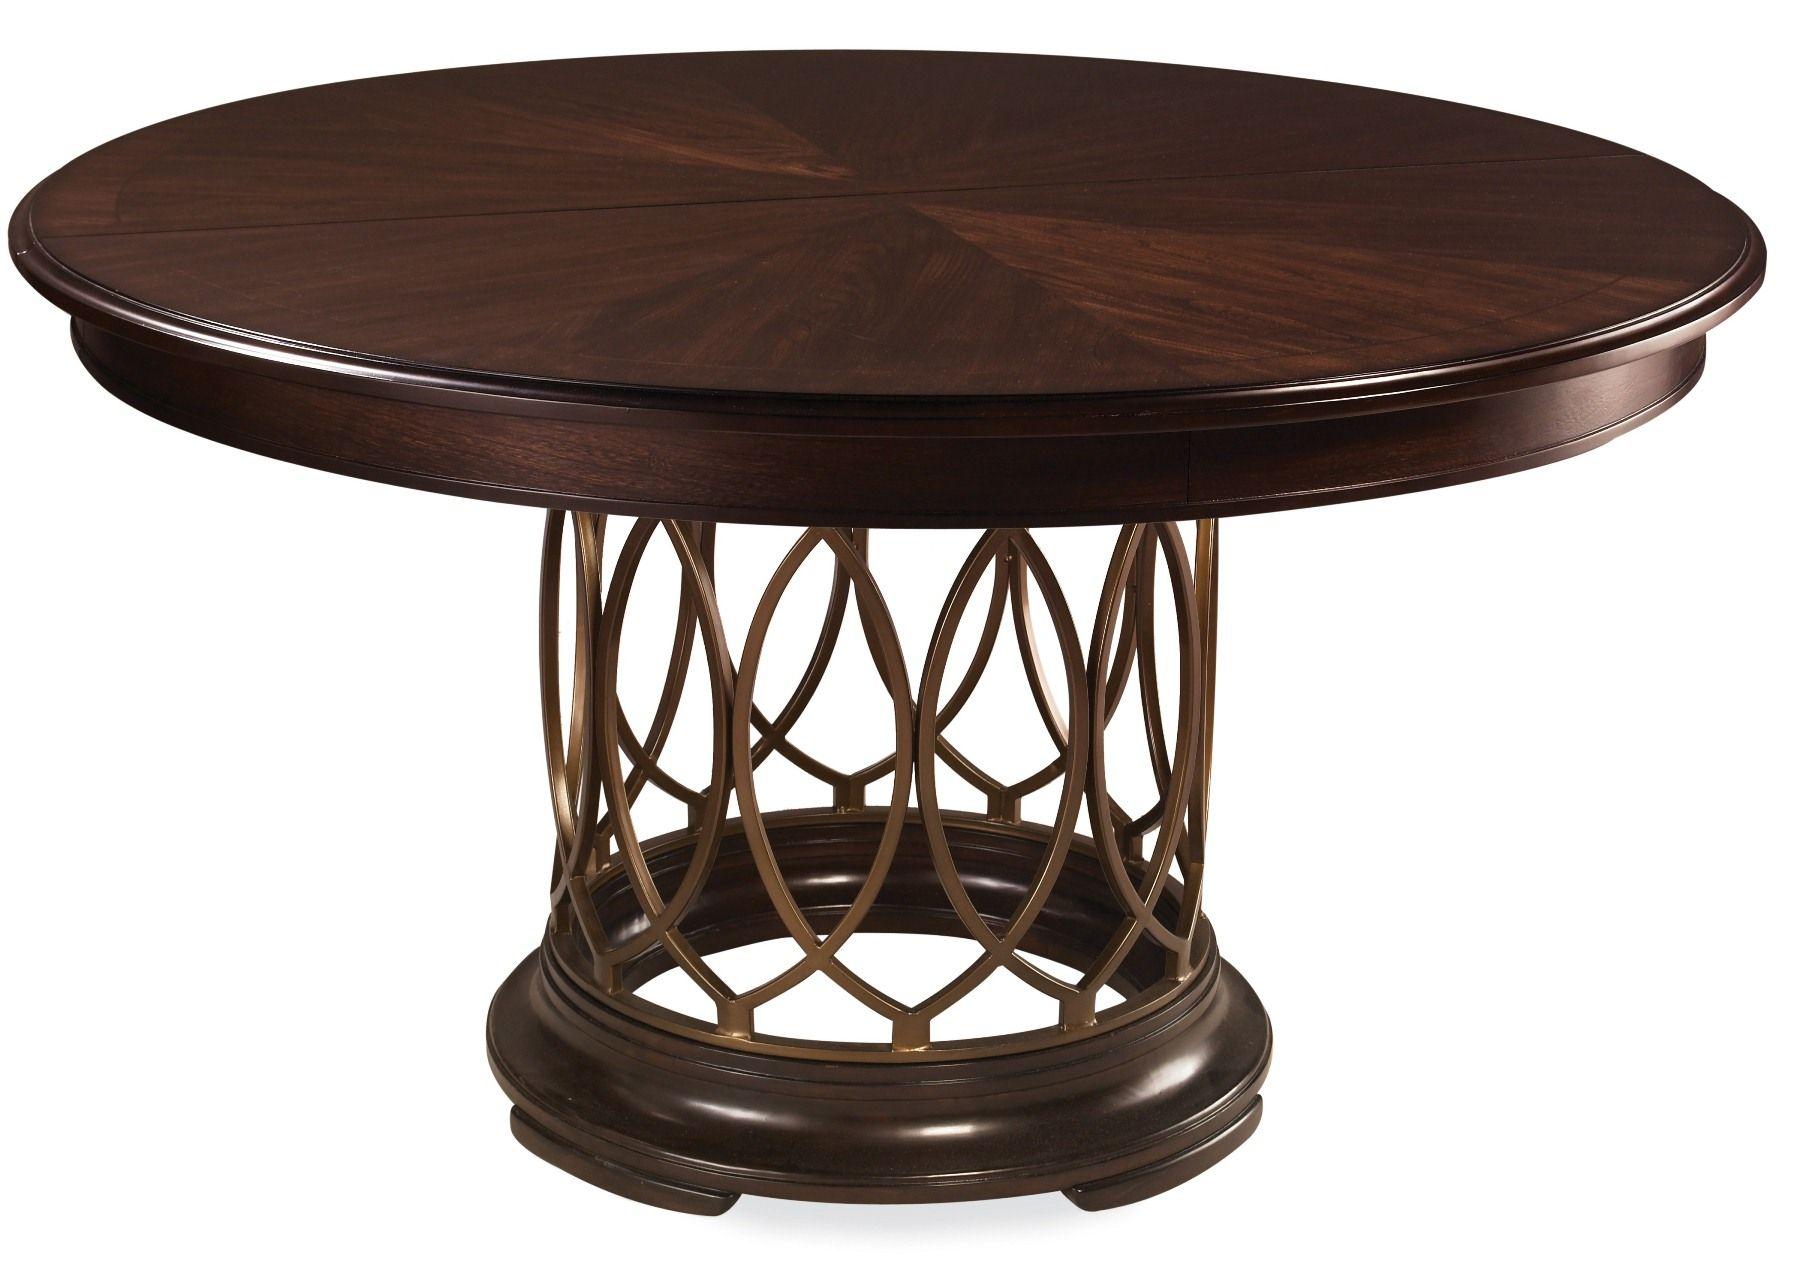 Round Wooden Dining Table Delhi Collection By INTERNI EDITION | Design  Janine Vandebosch | MEBLE | Pinterest